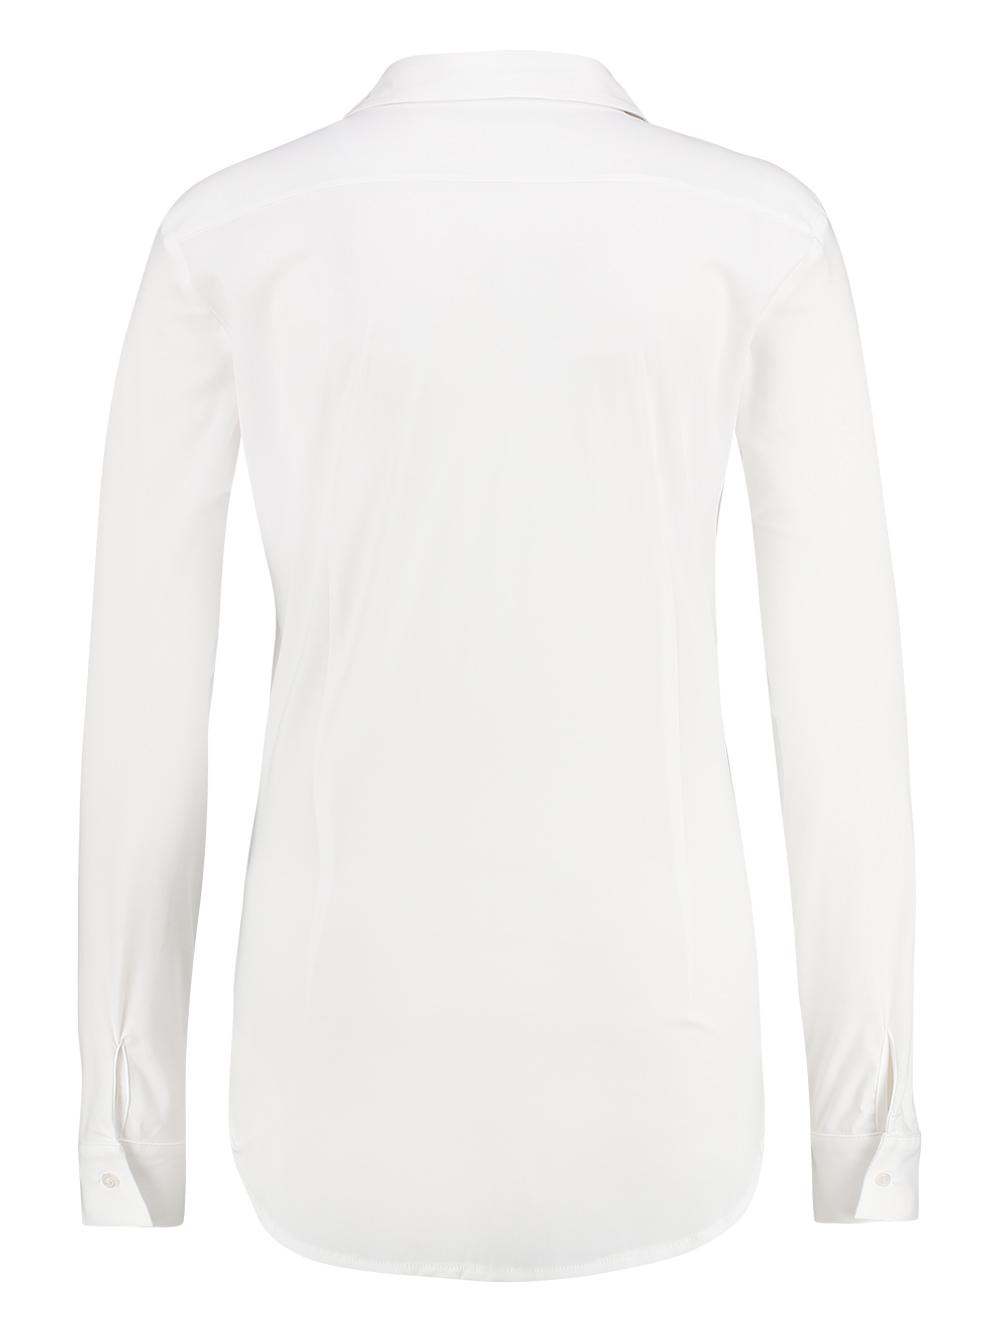 Poppy blouse - white